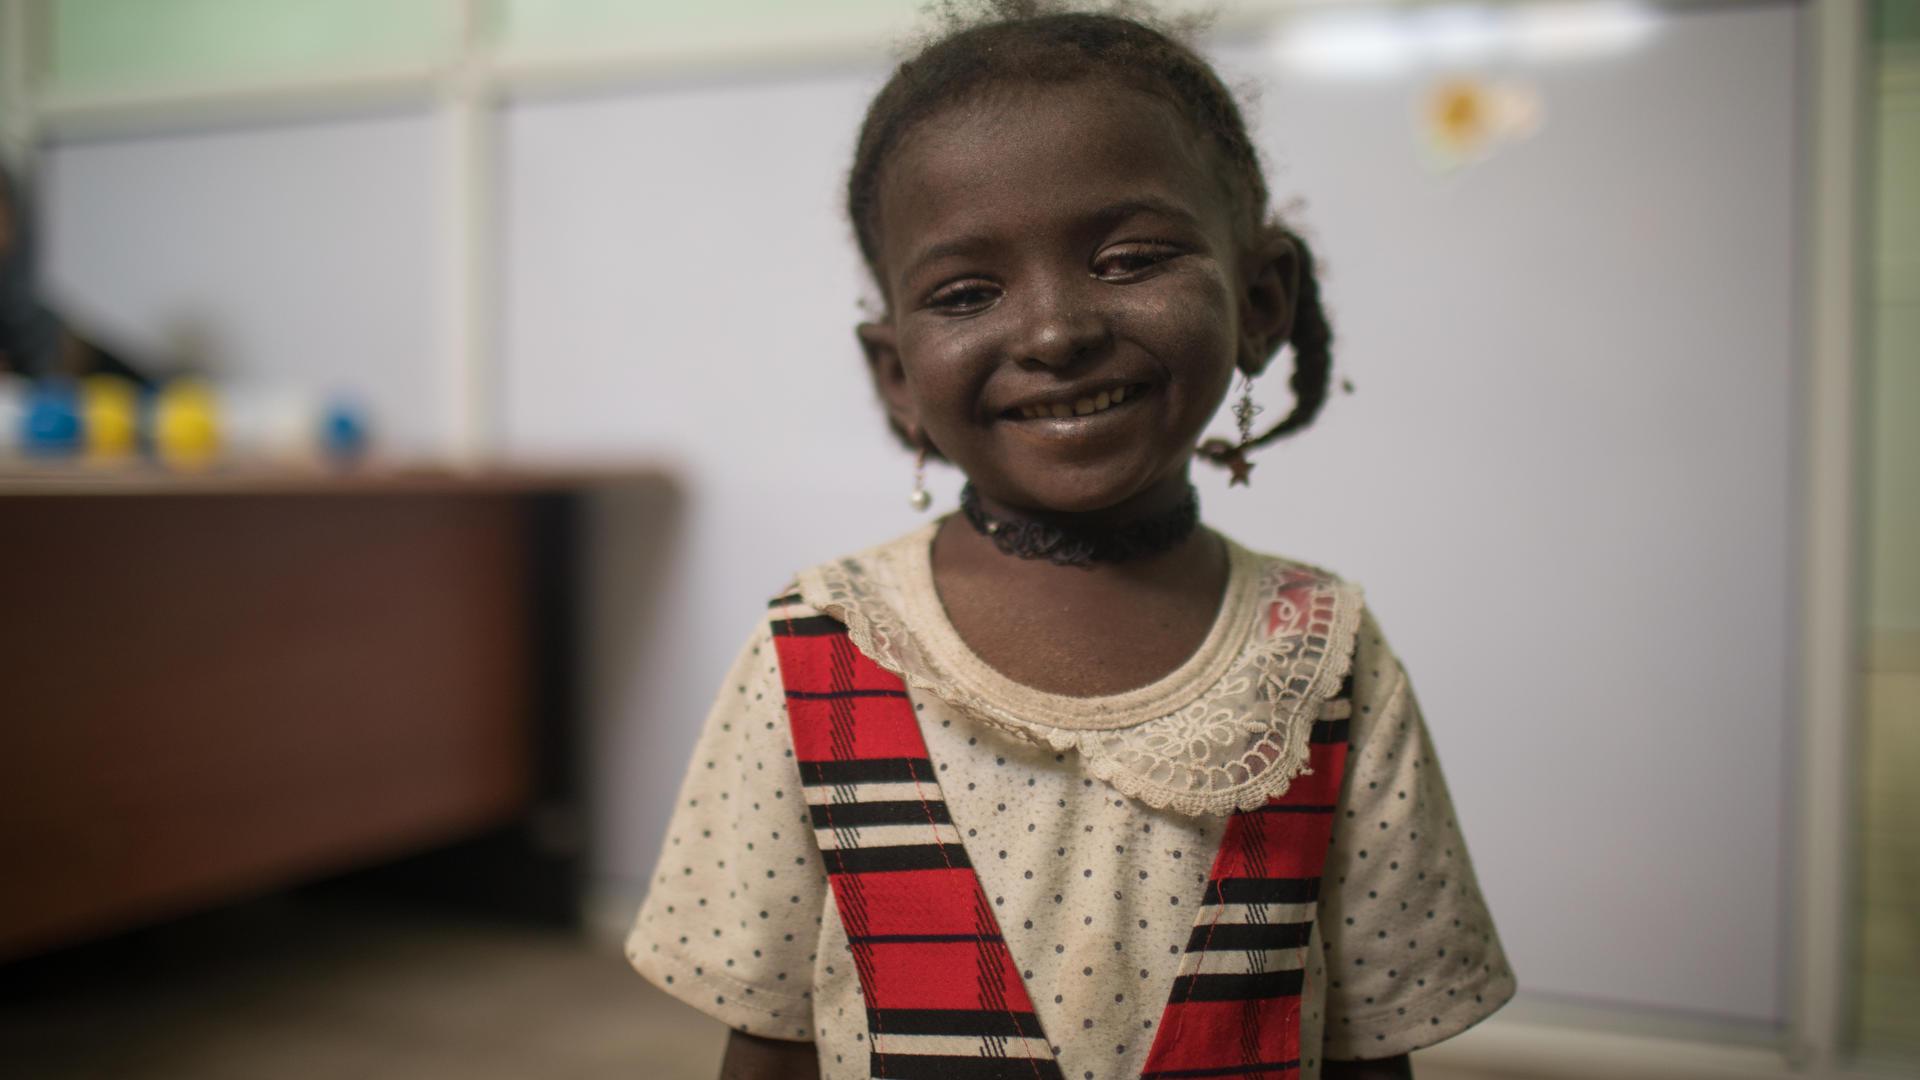 Five-year-oldYousra from Yemenissuffering from cancerin her left eye.